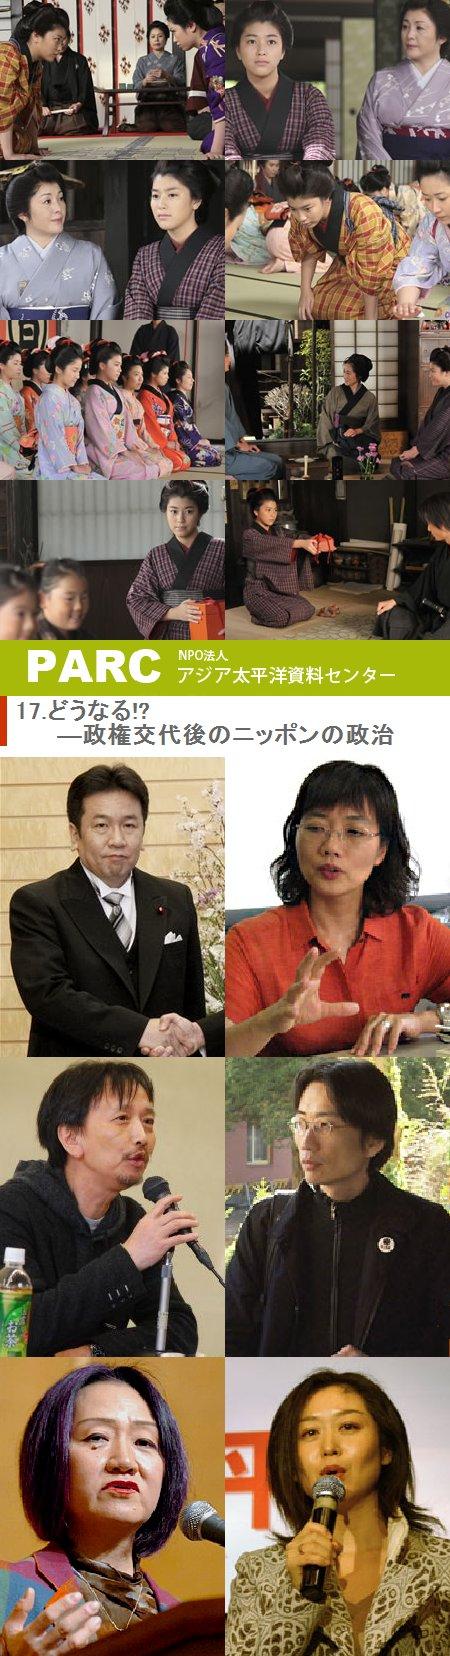 PARC自由学校_z